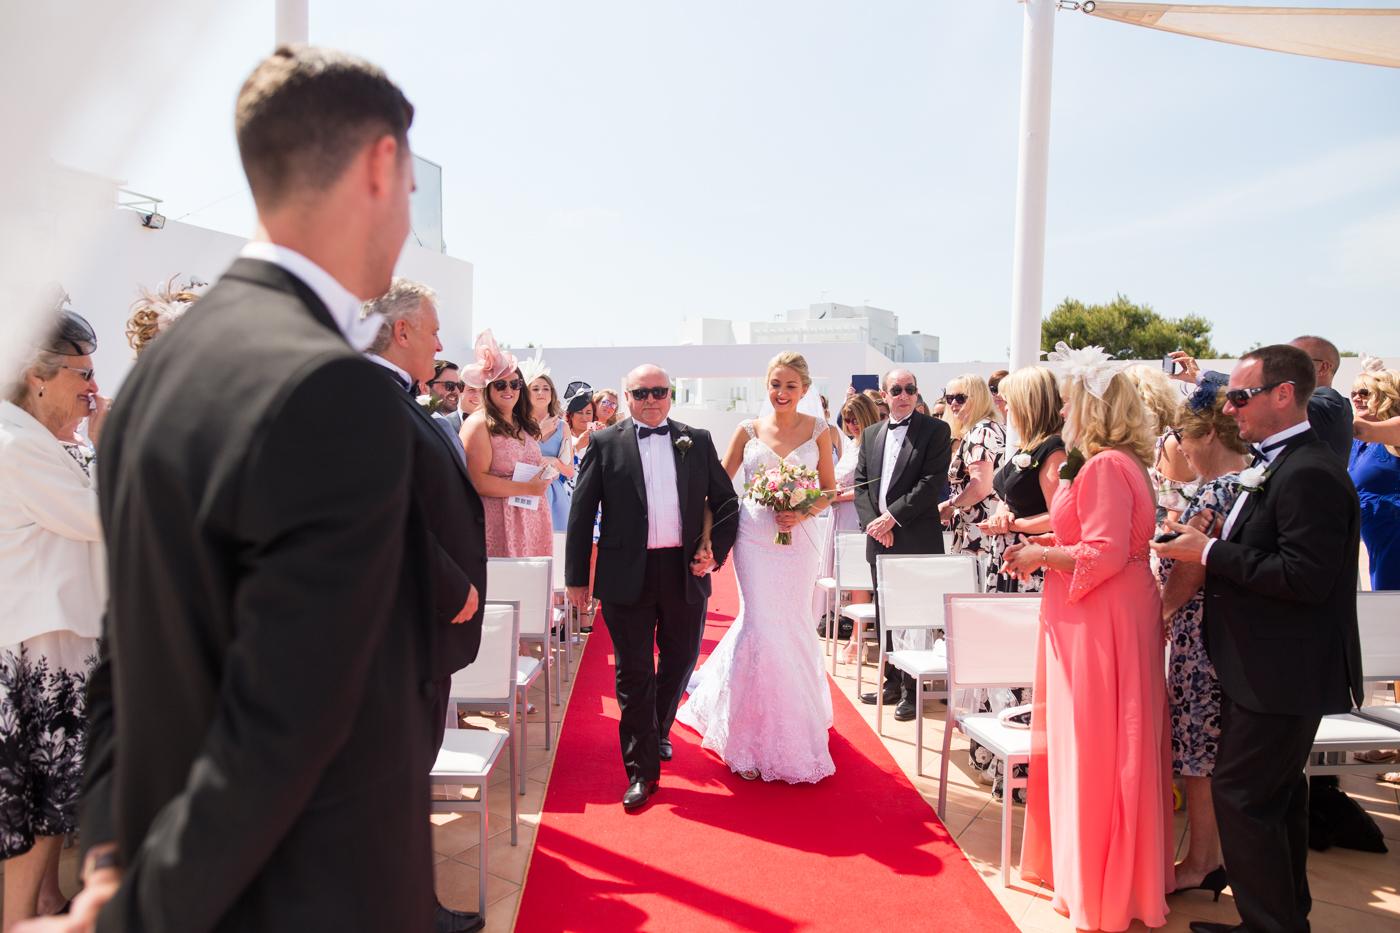 Majorca-destination-wedding-photographer-0025.jpg